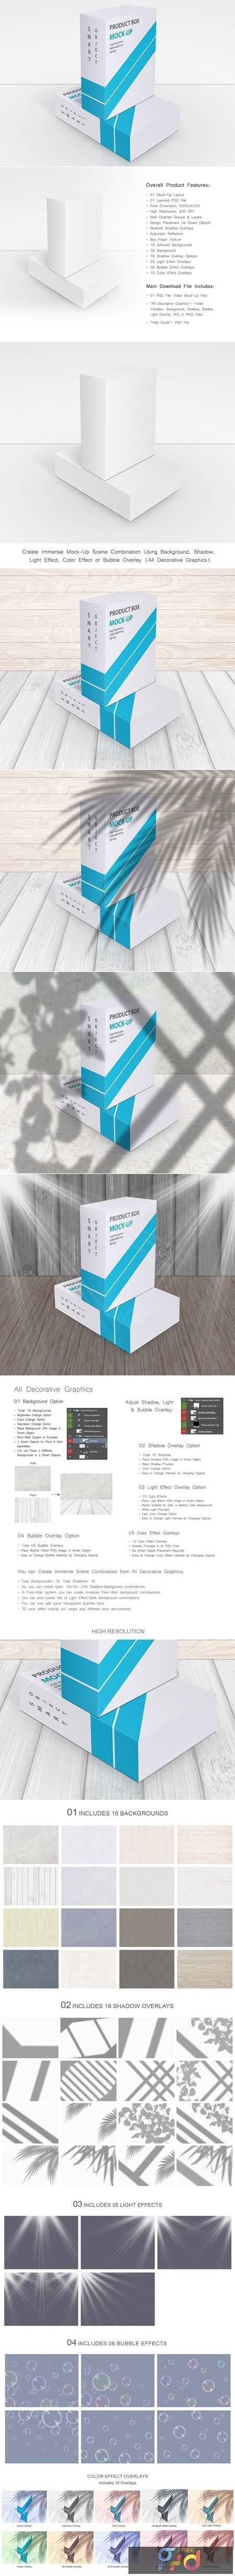 Product Box Mock-Up 07 5591841 1